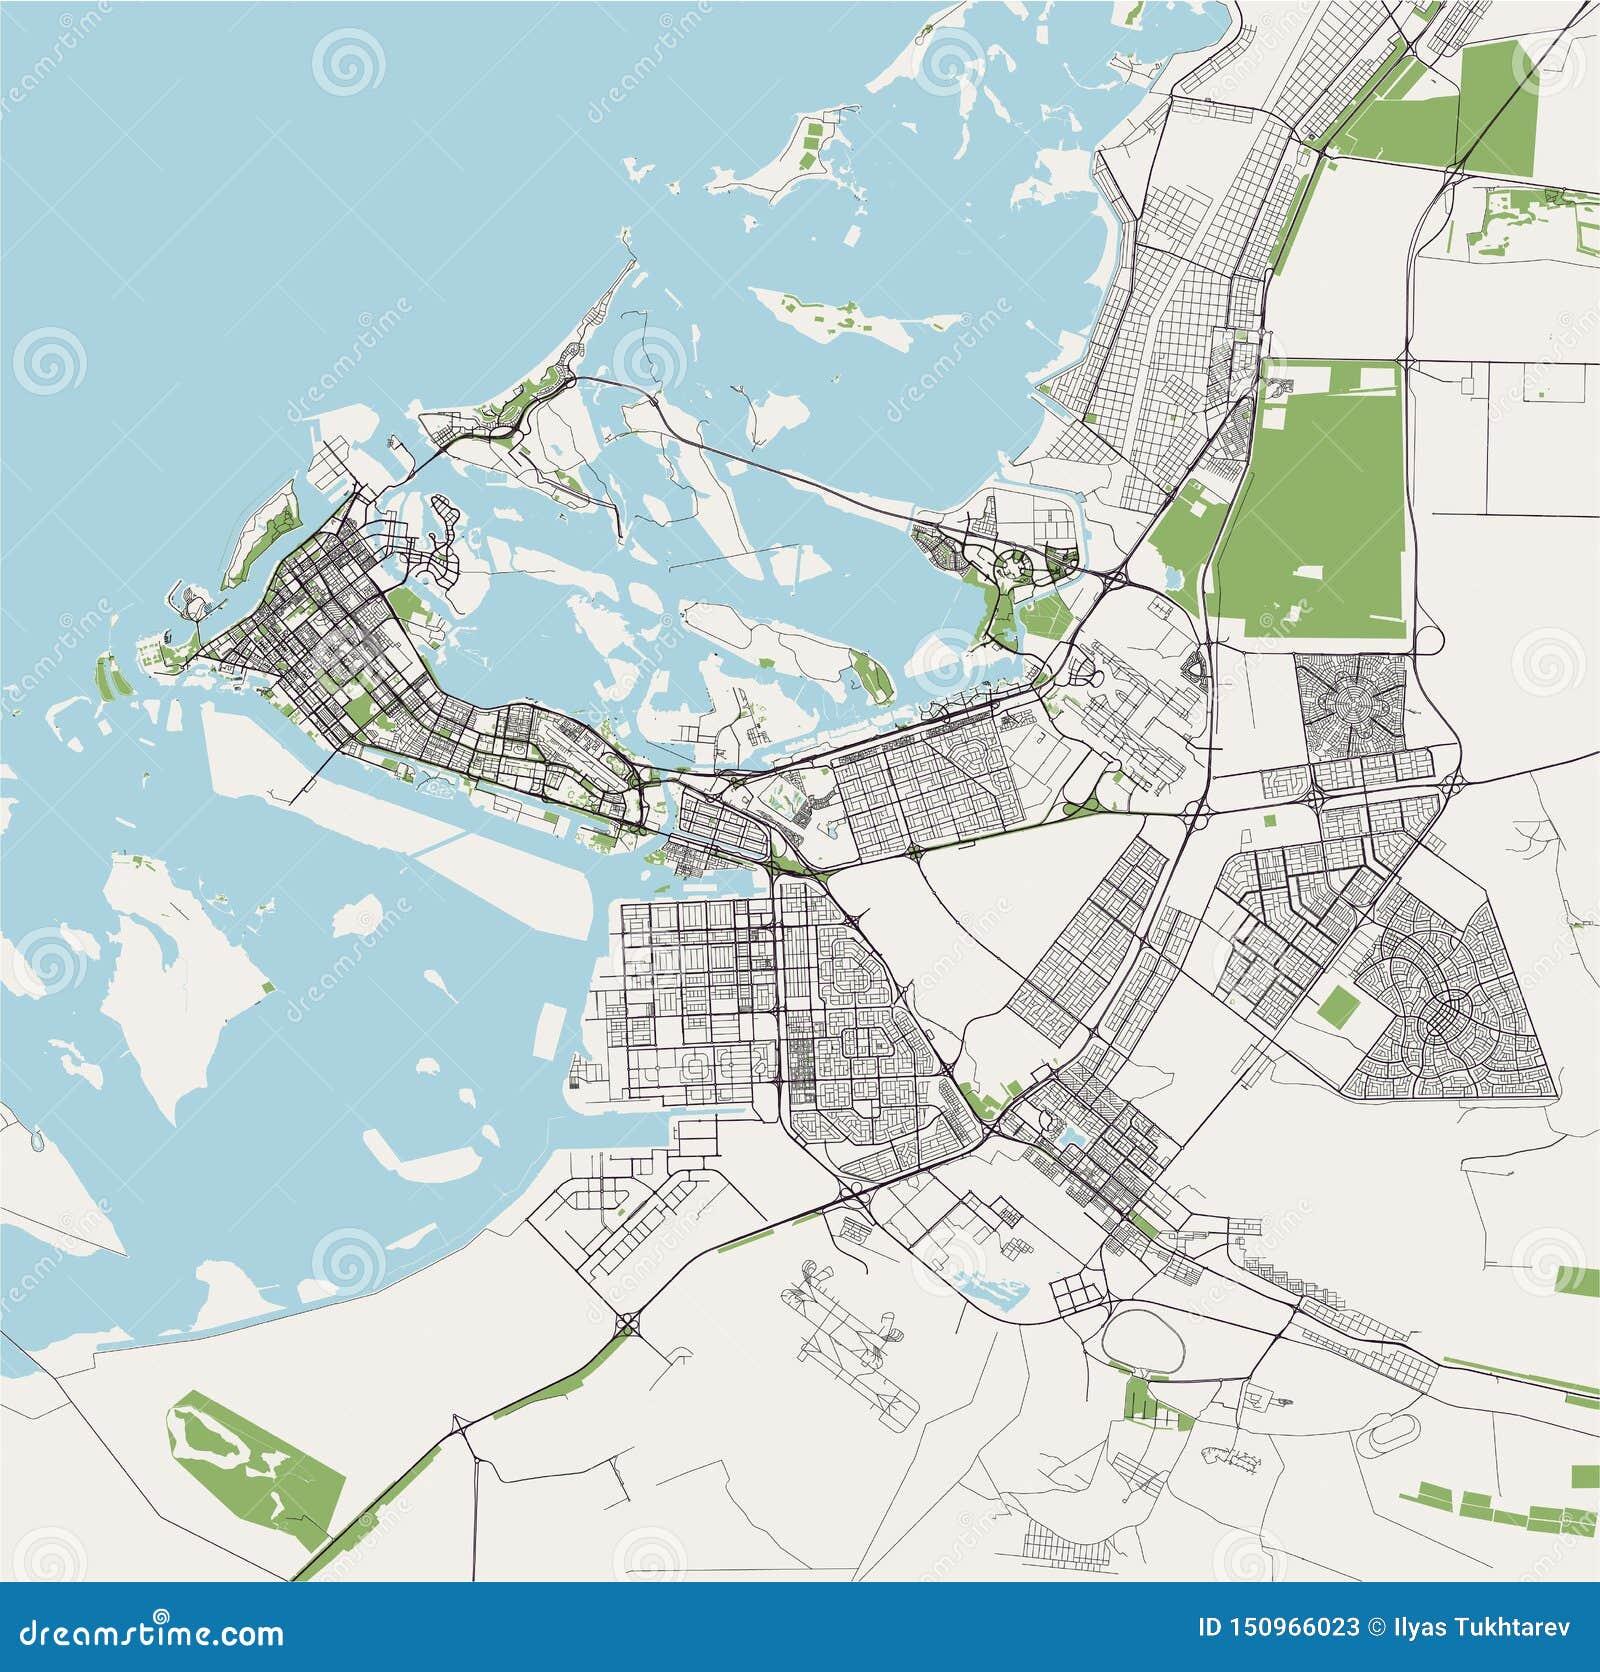 Map Of The City Of Abu Dhabi, United Arab Emirates UAE Stock ... Map Of Abu Dabi on dubai international airport, map of bissau, map of dubai, map of ndola, map of saudi arabia, sheikh zayed mosque, etihad airways, ferrari world abu dhabi, burj khalifa, map of doha, emirates palace, map of haydarpasa, map of china, ras al-khaimah, map of muscat, khalifa bin zayed al nahyan, united arab emirates, map of africa, map of india, map of kharian, map of baghdad, map of hong kong, map of sulaymaniyah, map of tel aviv, map of sohar, al ain, map of hadramaut, map of irbil, map of united arab emirates, map of uae, persian gulf,